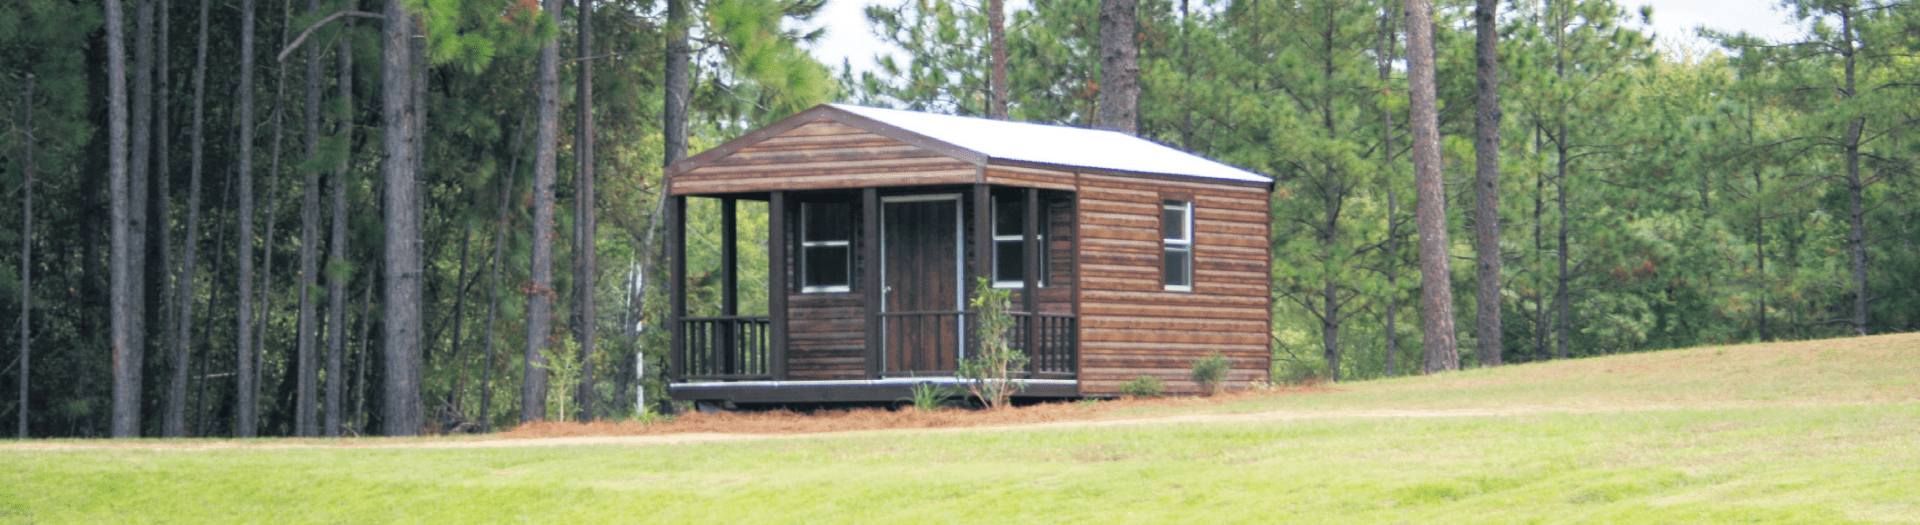 slide-porch2